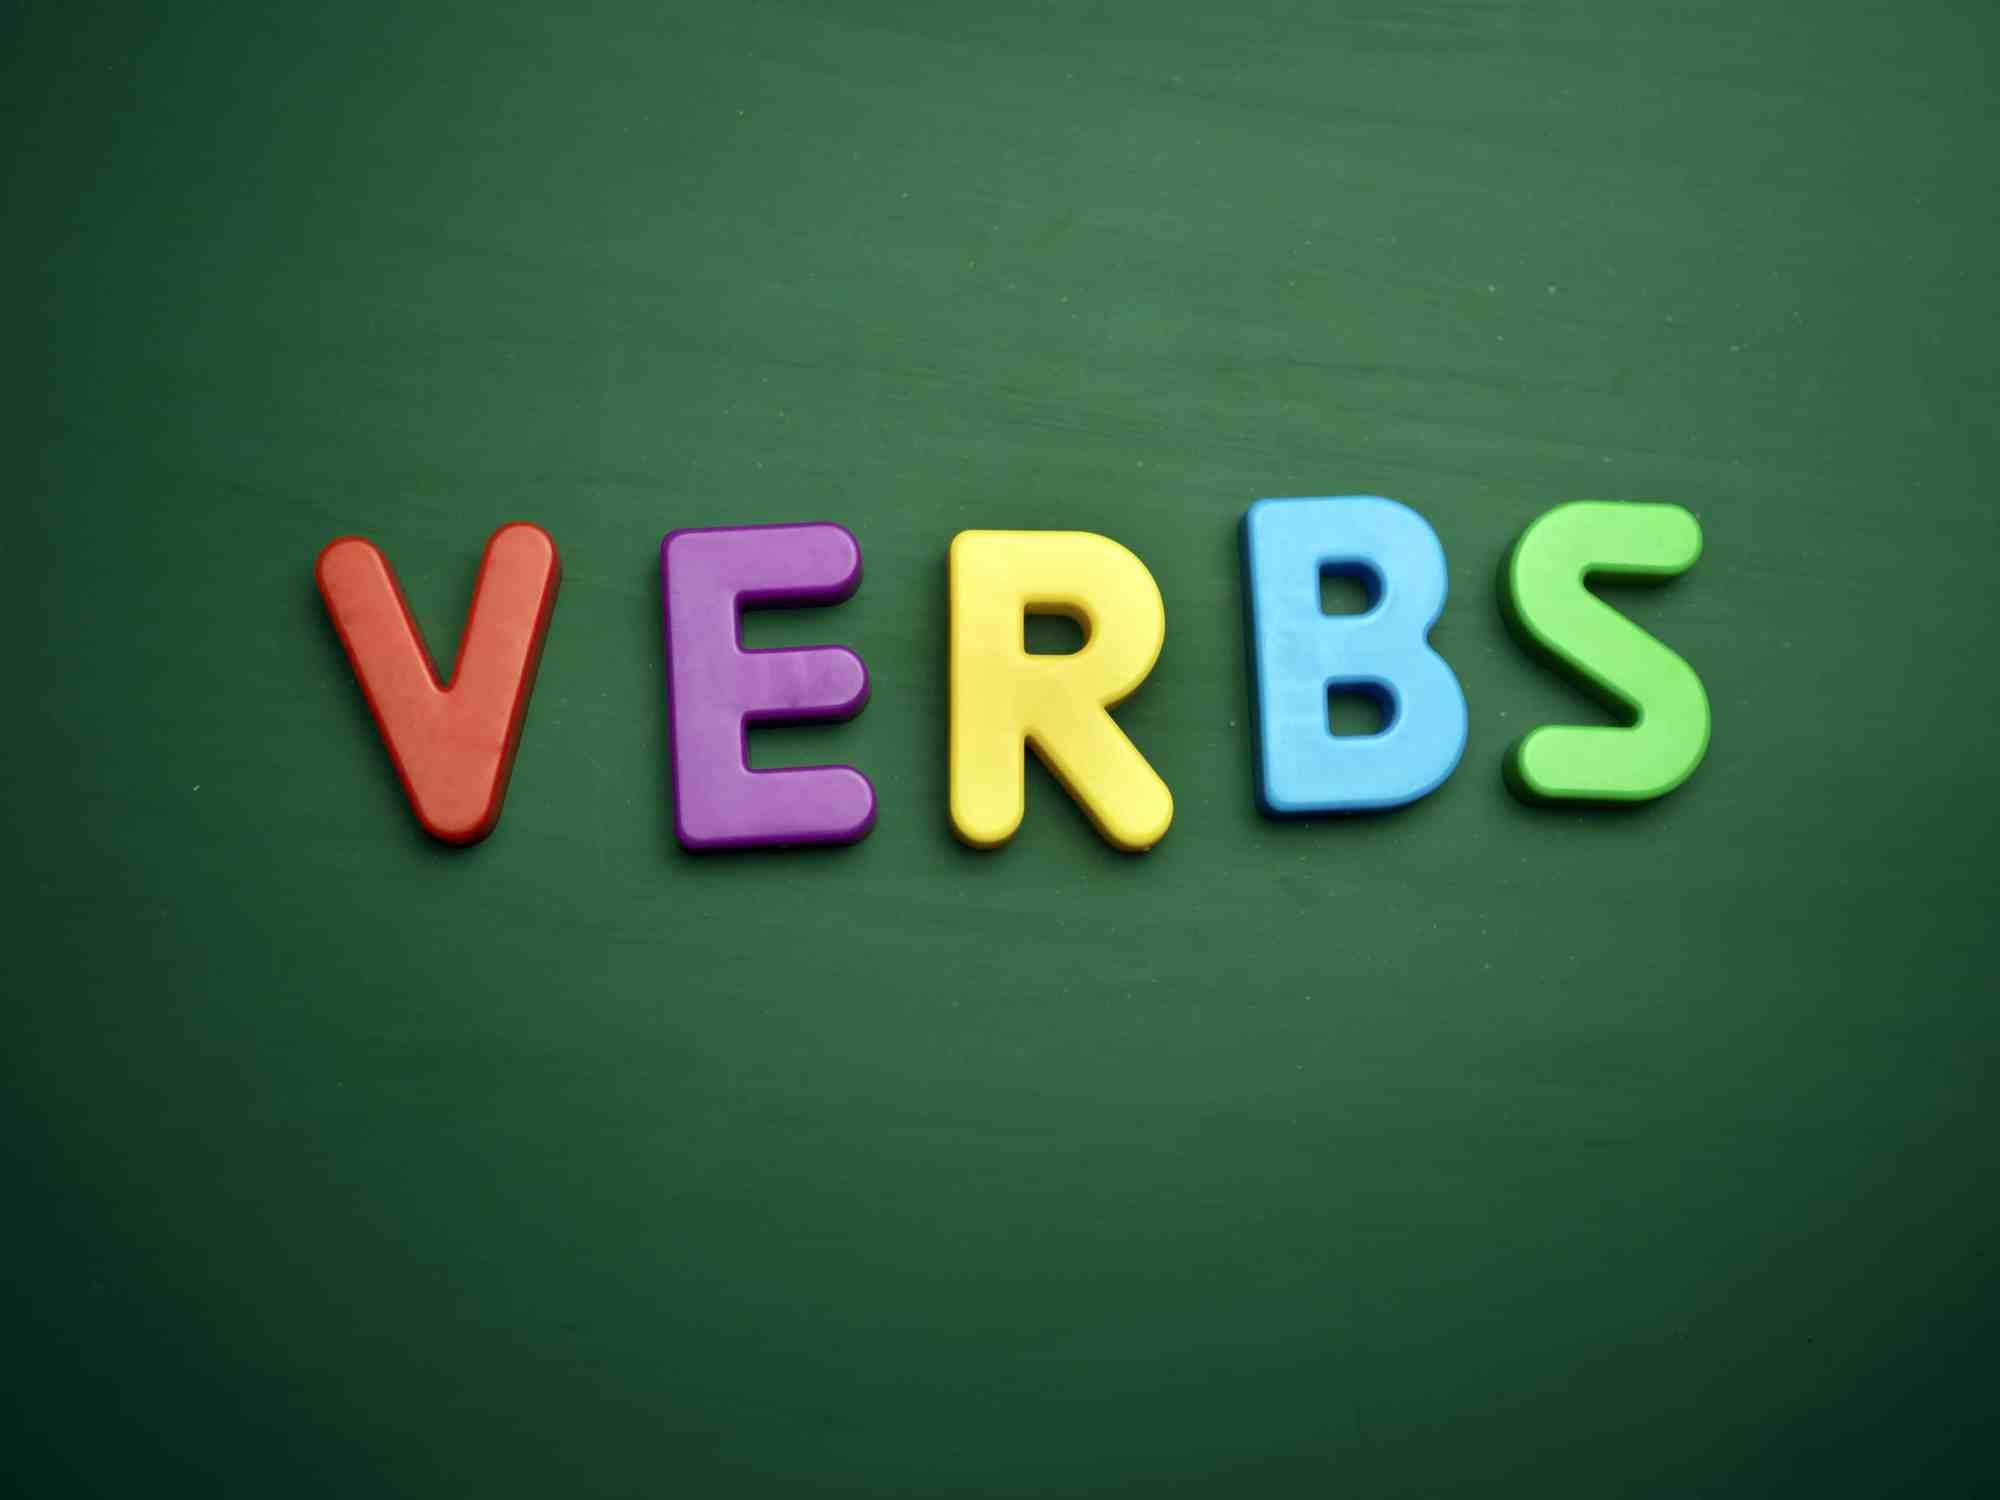 hight resolution of List of Verbs